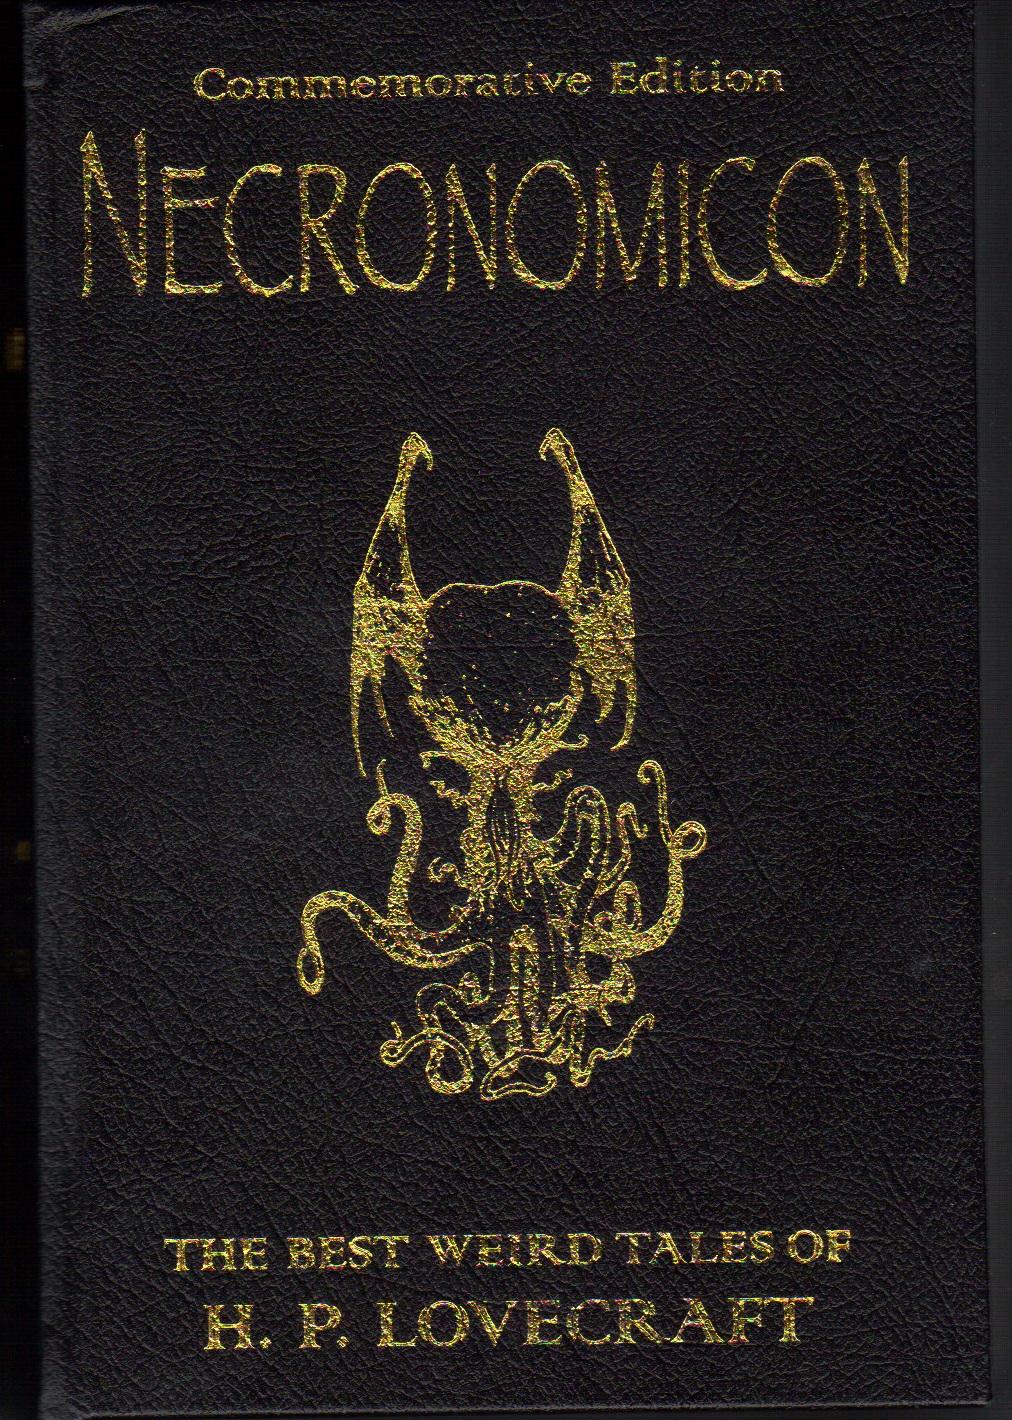 H.P. Lovecrafts Necronomicon